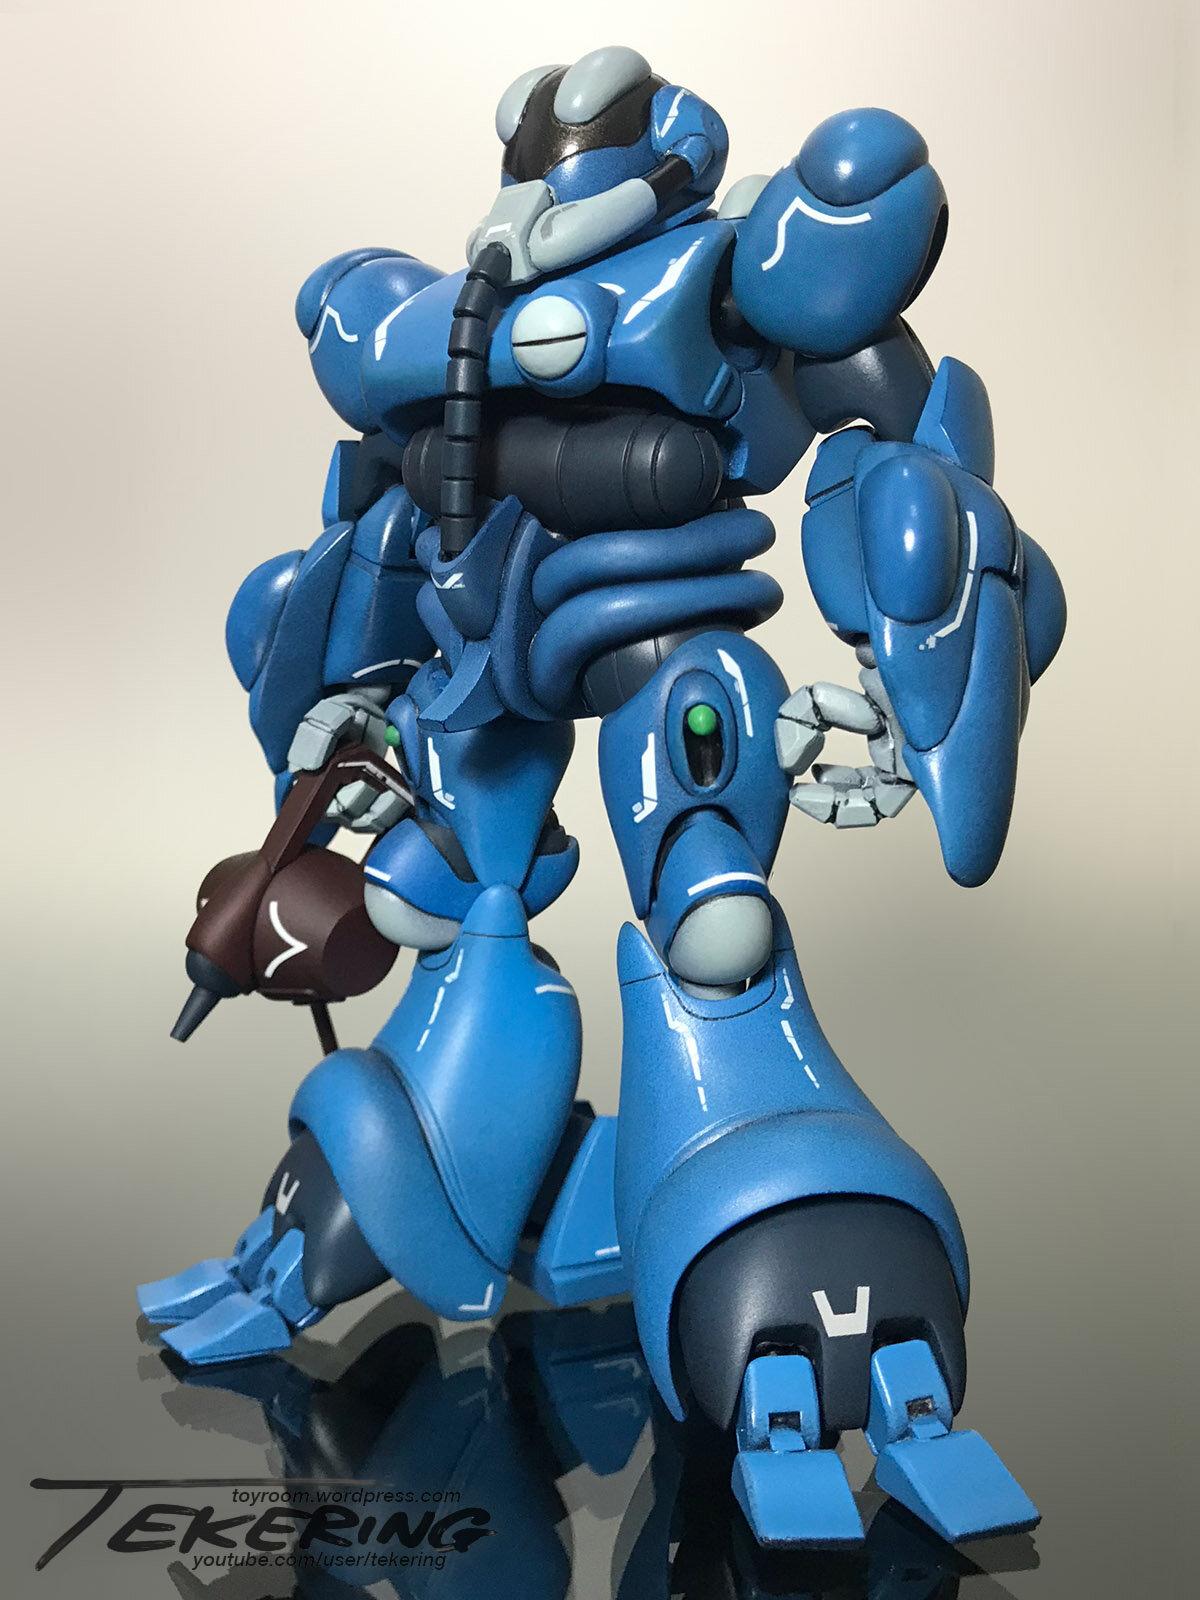 Bioroid-Soldier-Blue-TBr-I-Mk.I-Nousdohl-Warrior-1.jpg.1de62201ea8955f7f2f22dc4cff5b825.jpg